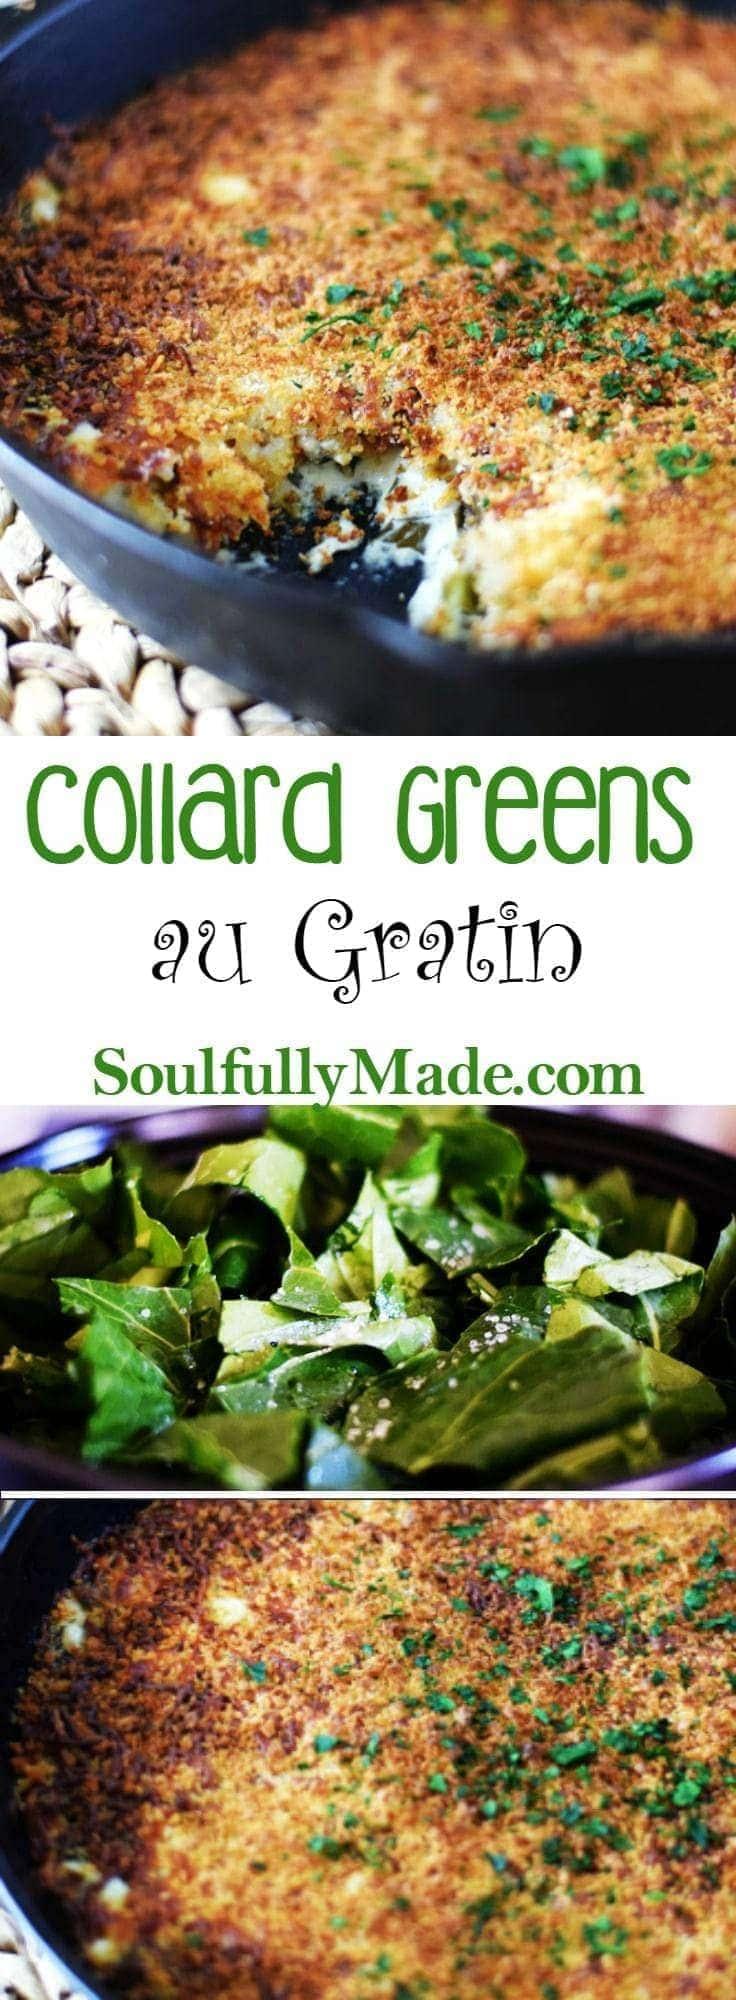 Collard Greens Au Gratin